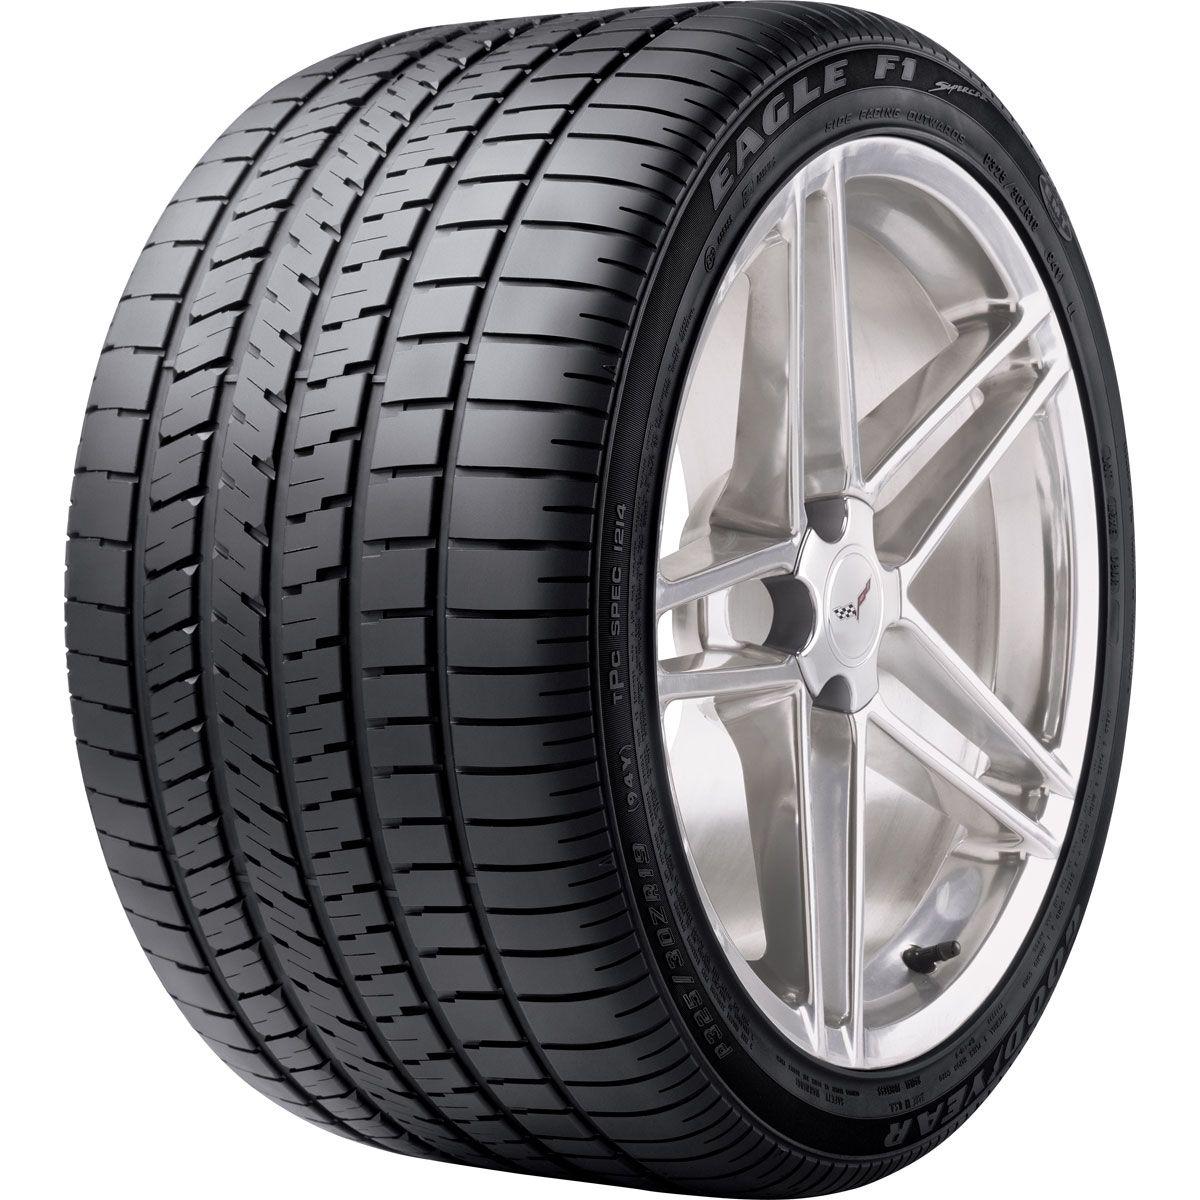 Eagle F1 Supercar Tires Super Cars Goodyear Eagle Goodyear Tires